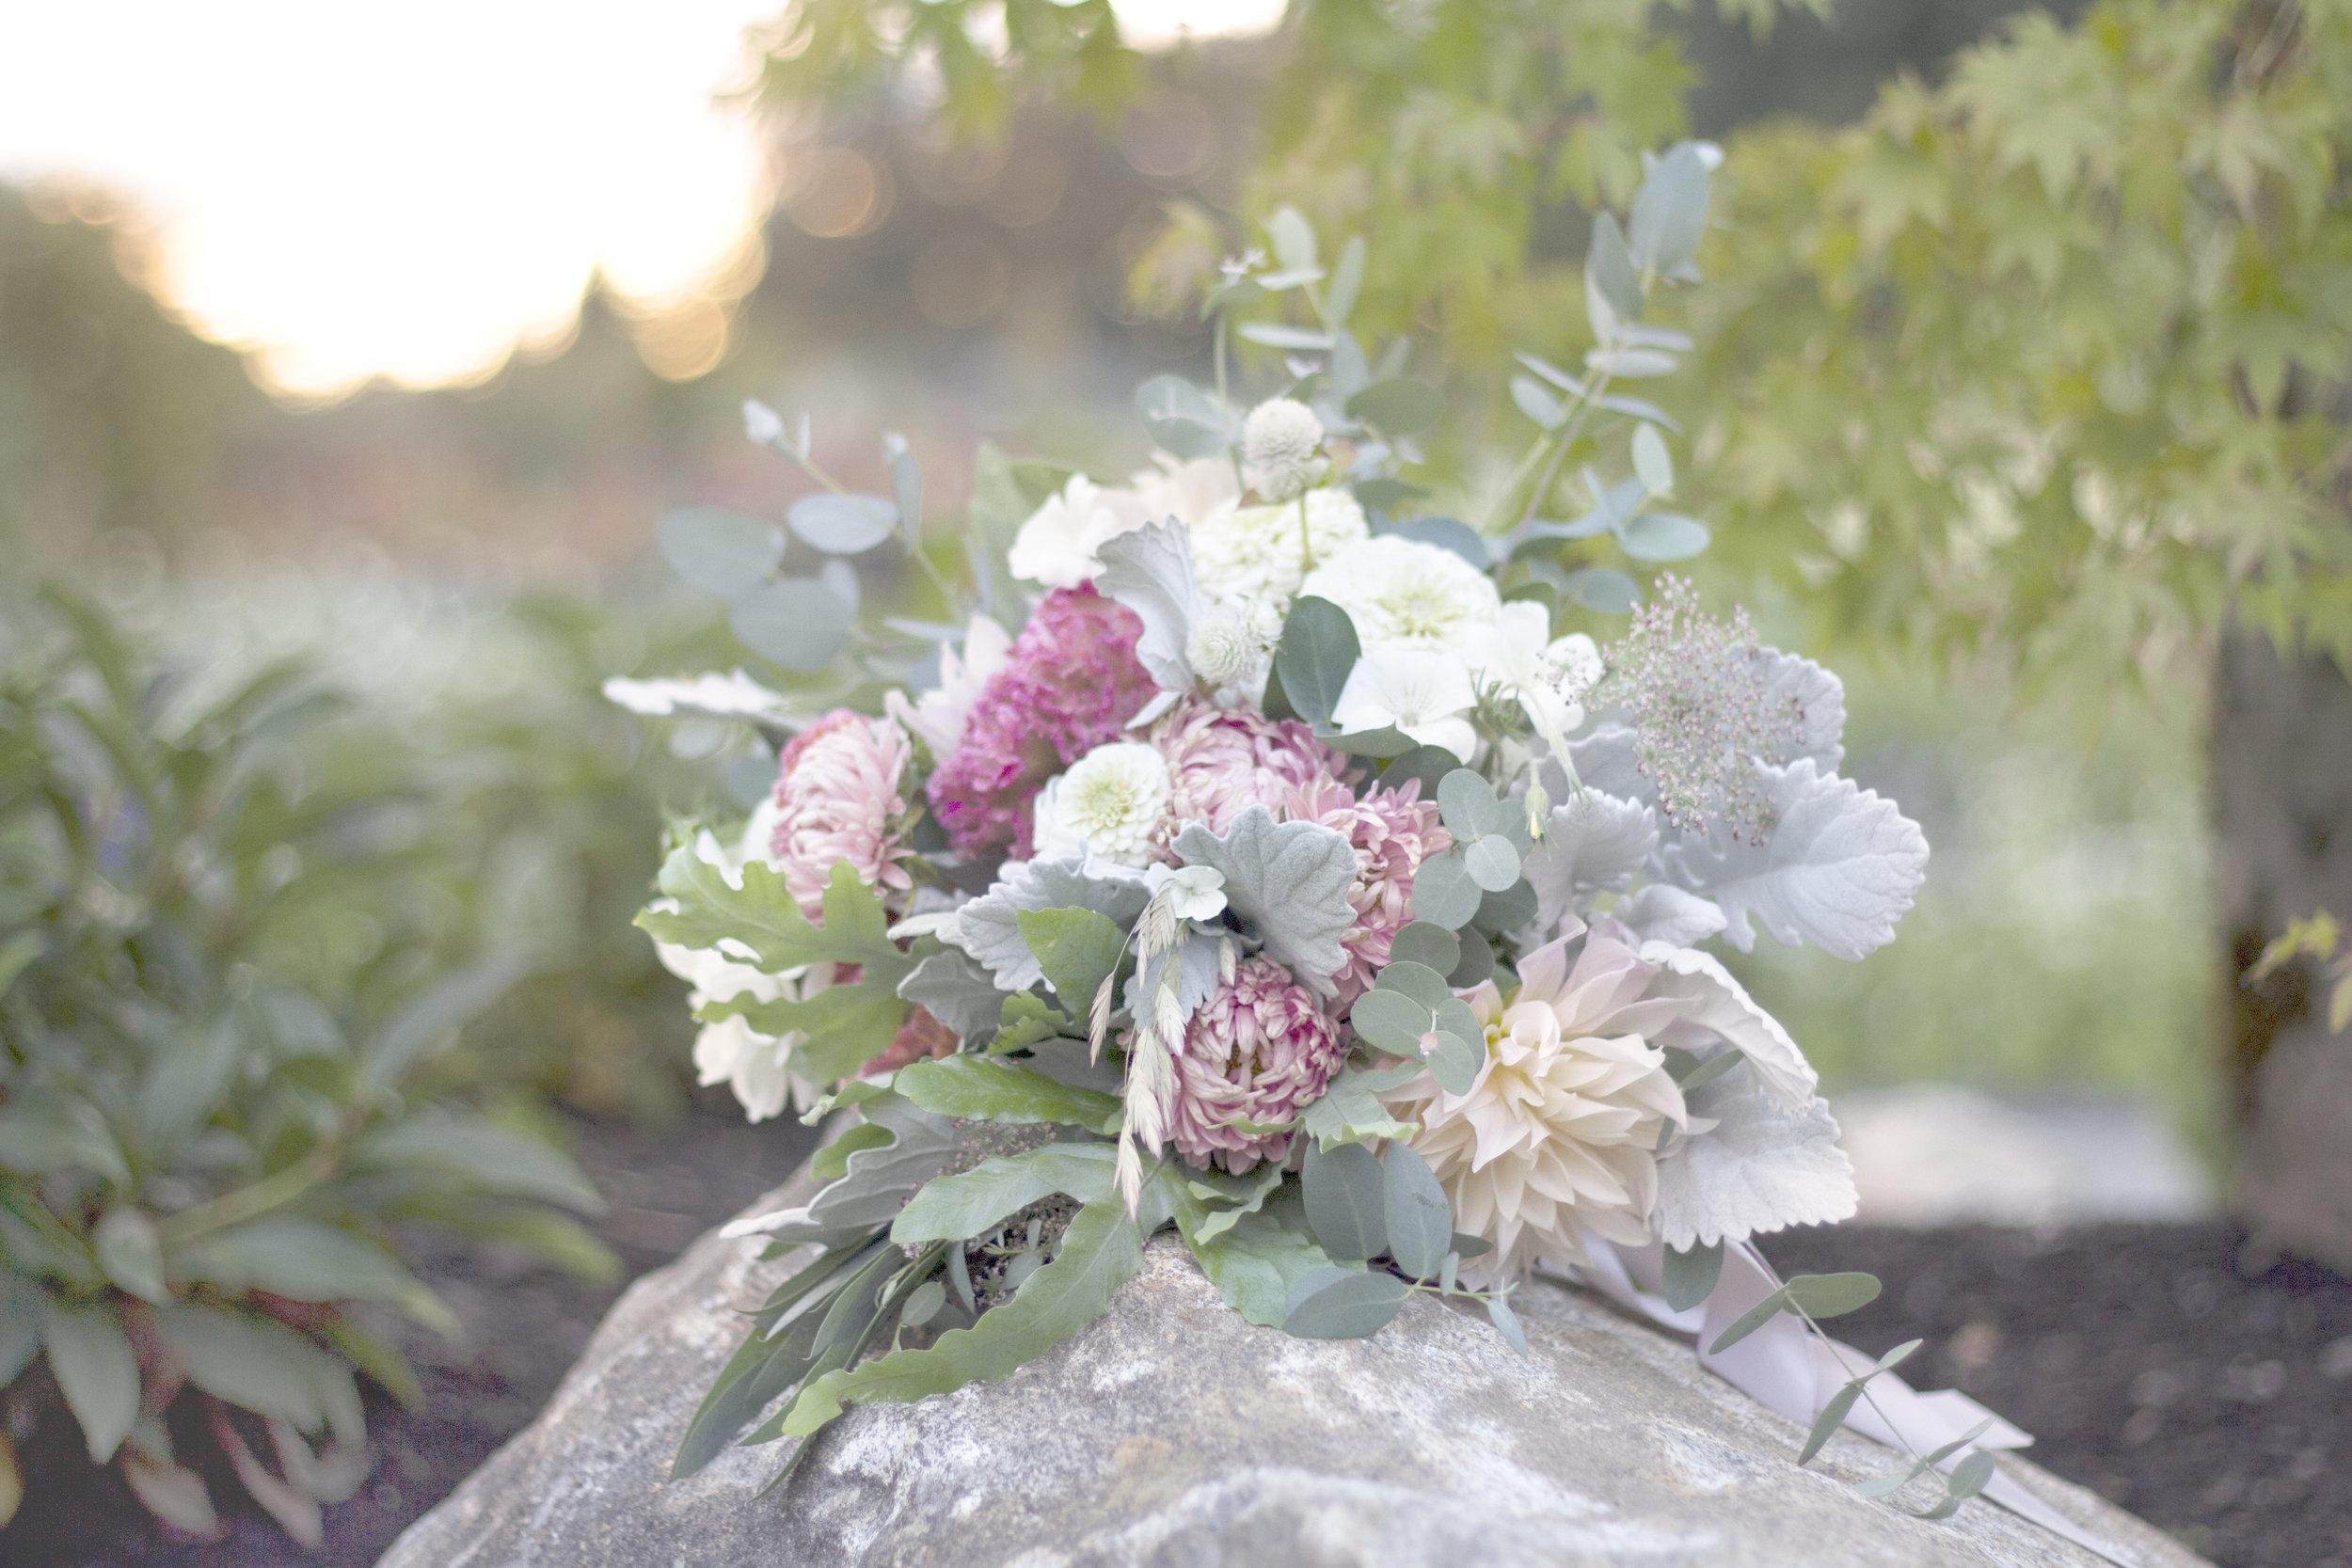 reduced_screened back_ss_bridal_bouquet_sunset_dusty_aster_euc_cafe_au_lait_dahlia.jpg